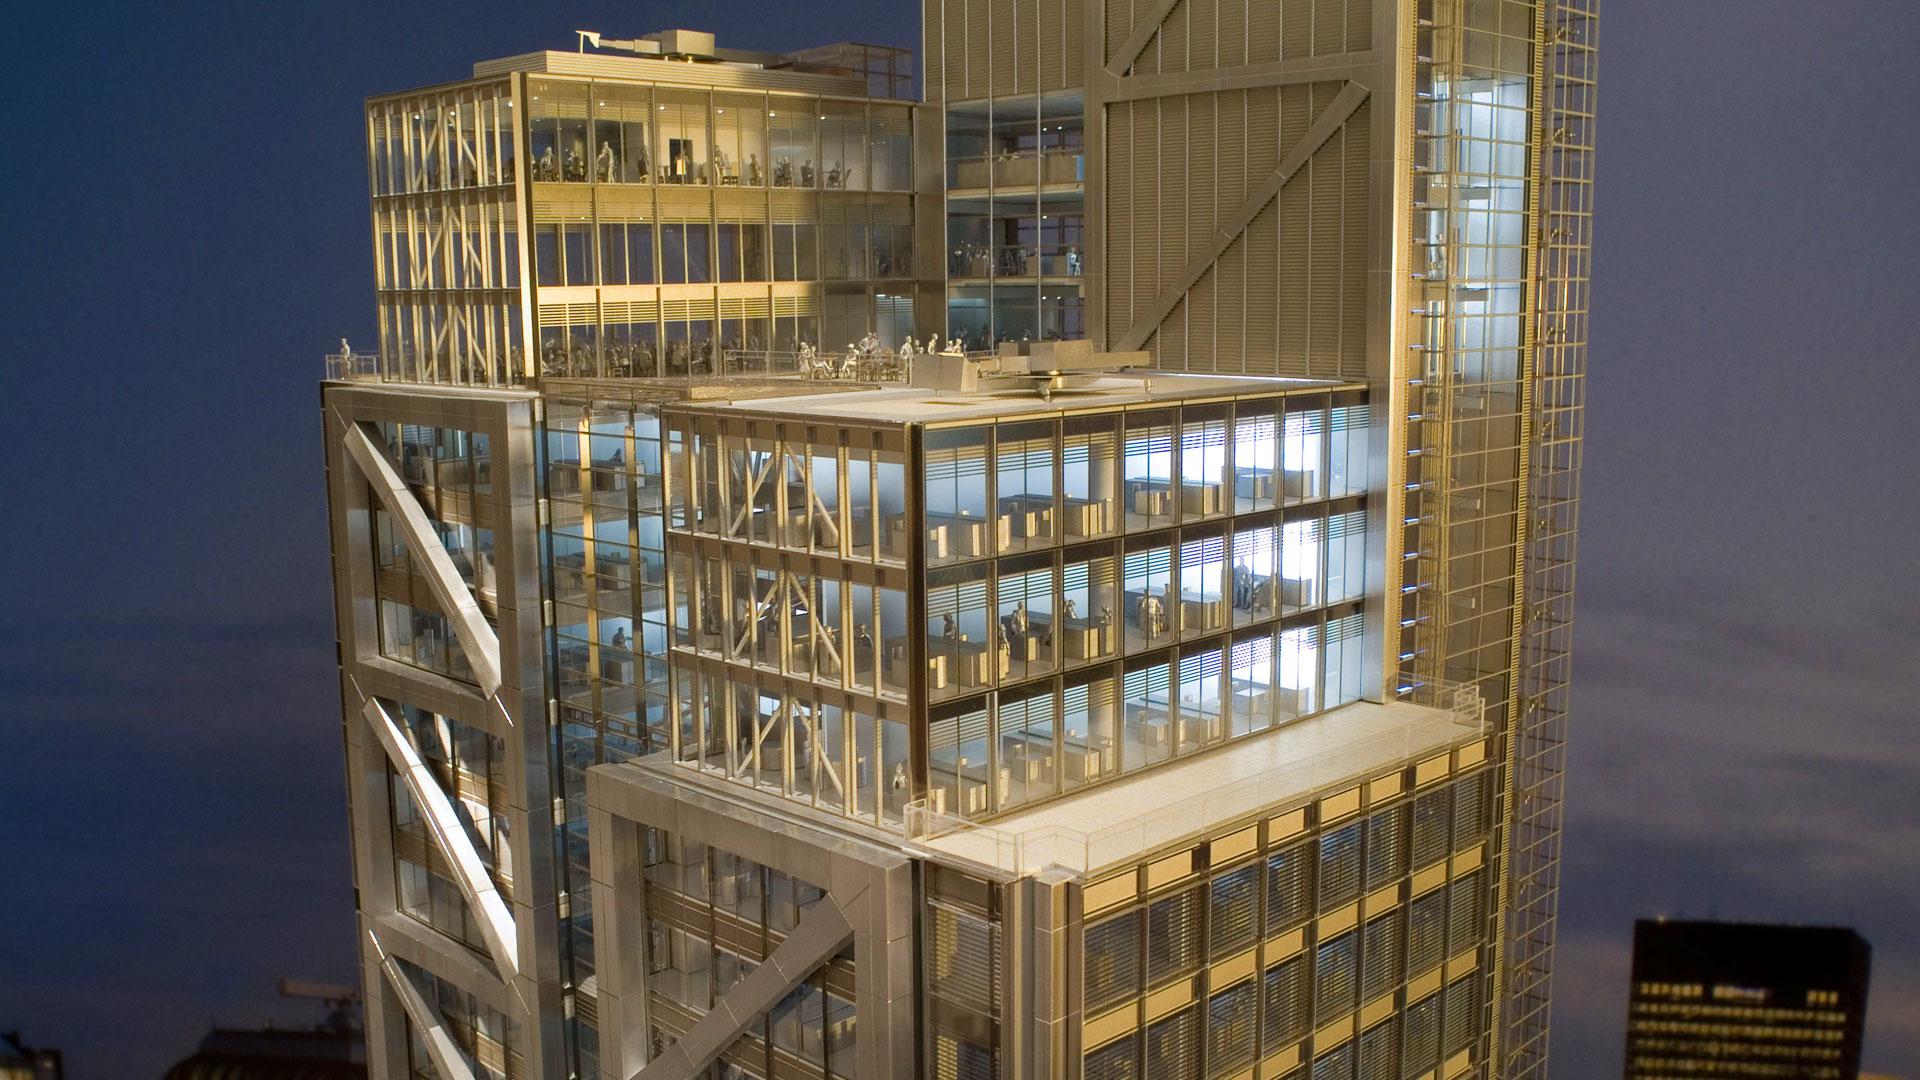 Building Architectural Models kandor architectural models, model makers in london, uk   home